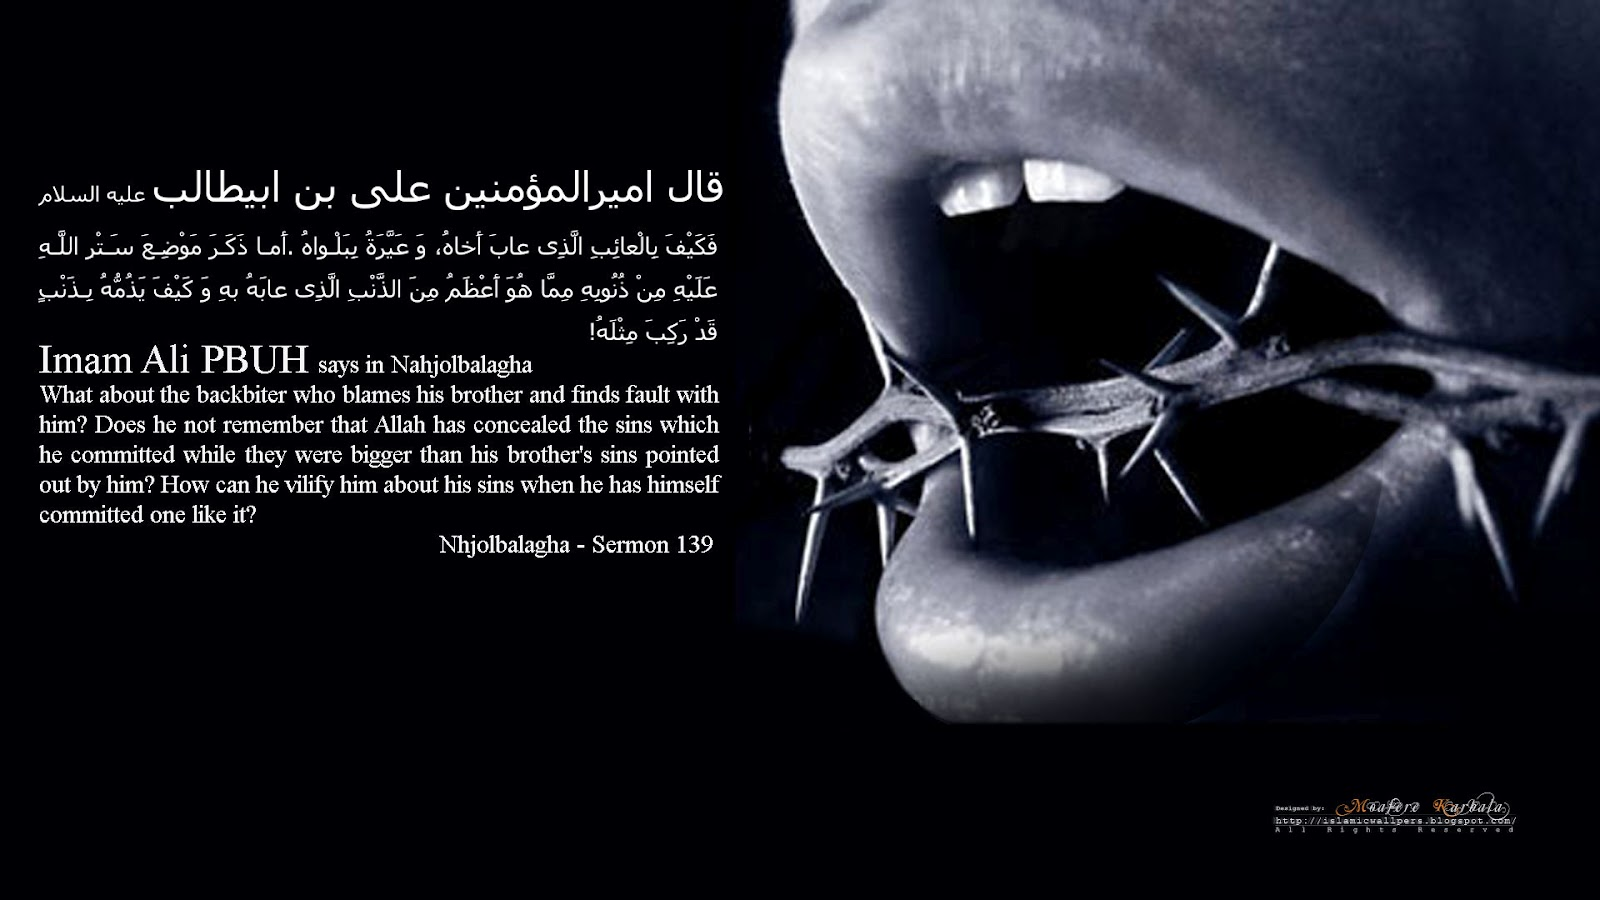 jesus and muhammad relationship advice